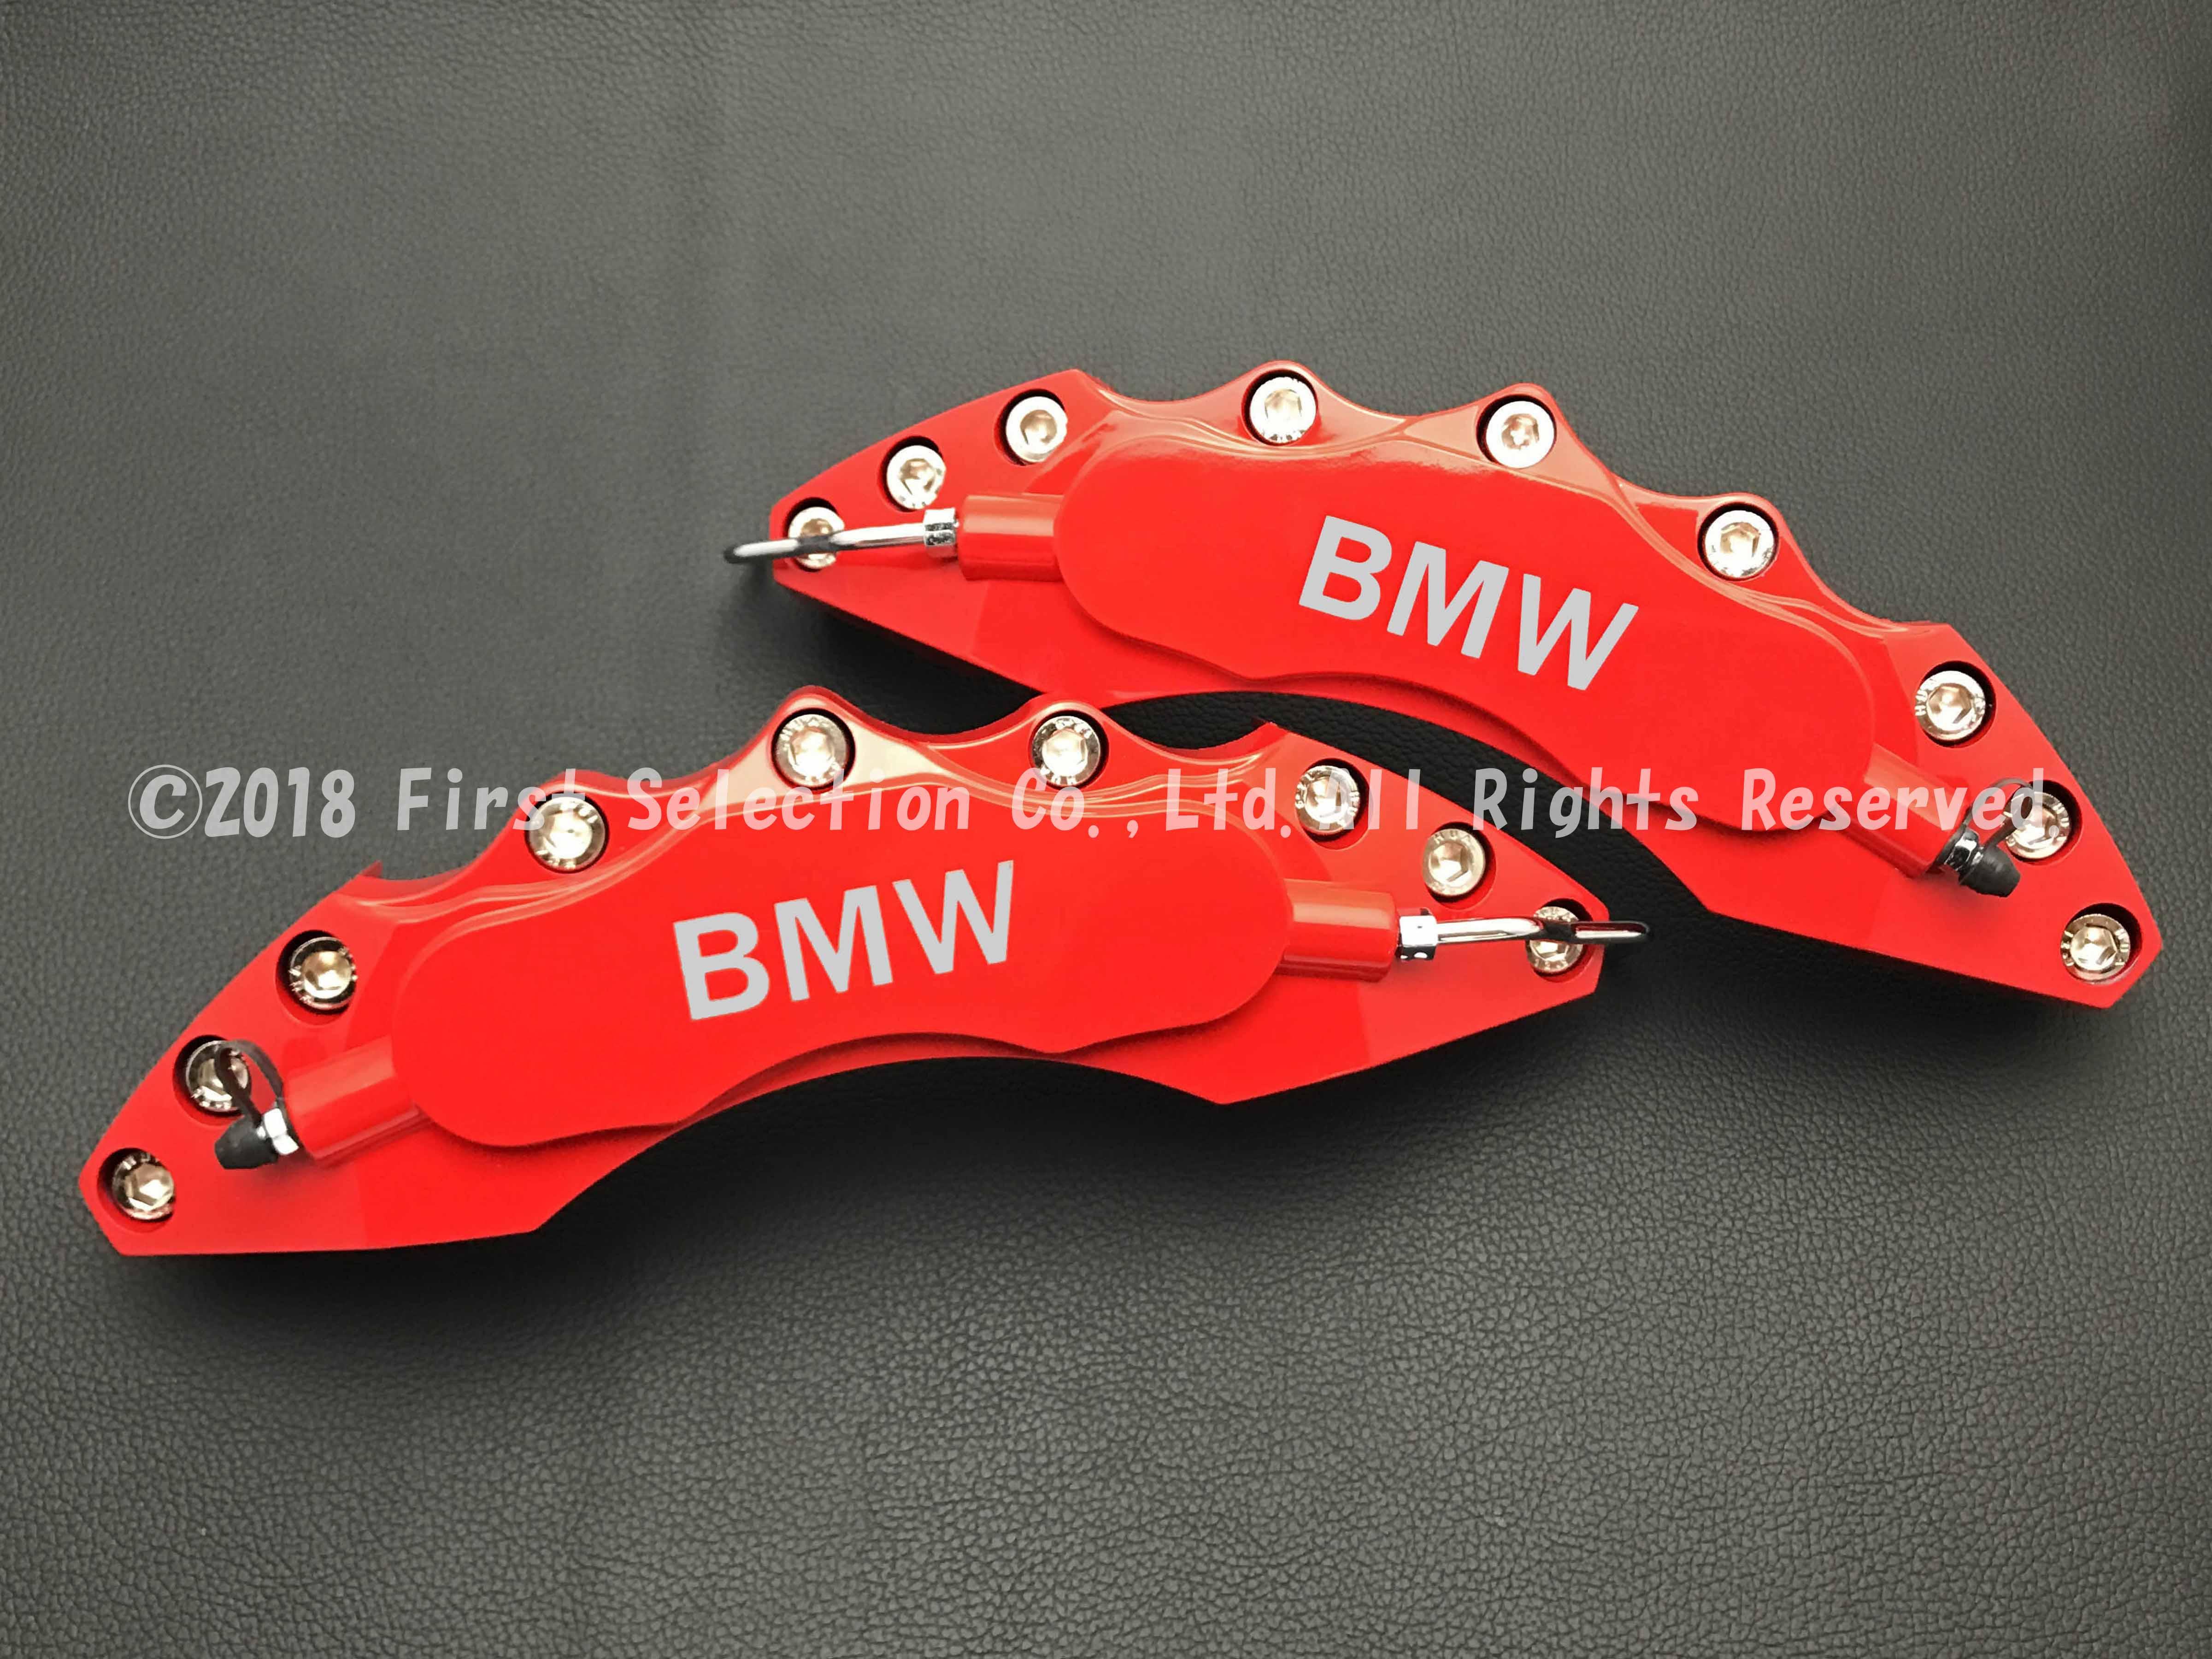 BMW車 BMWロゴ銀文字 汎用高品質キャリパーカバー赤 Lサイズ